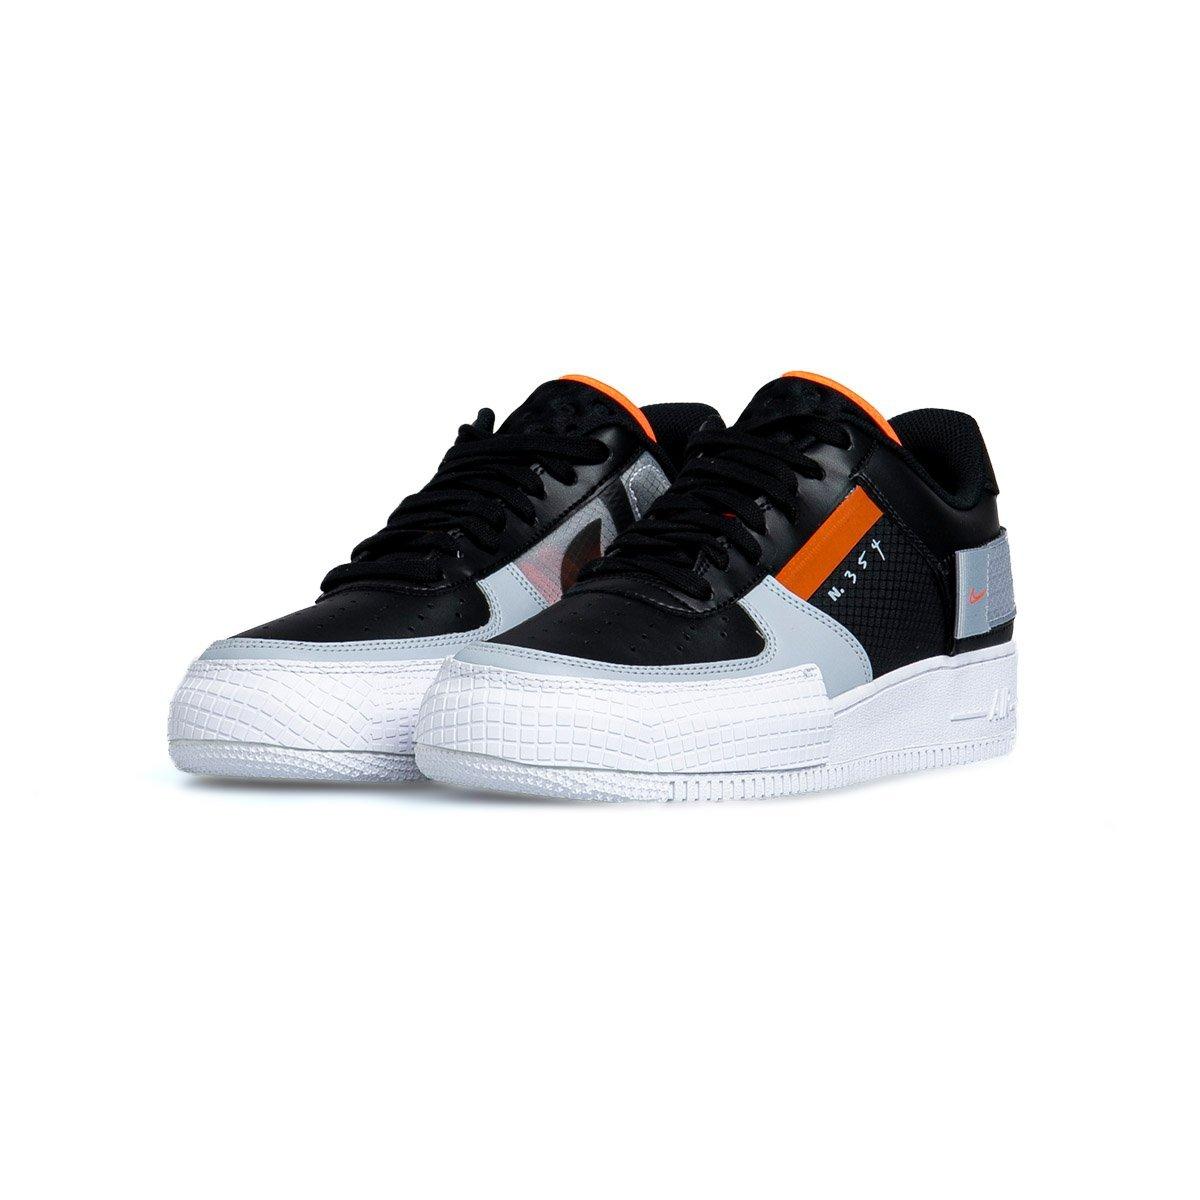 NIKE AIR FORCE 1 TYPE CQ2344 101   kolor BIAŁY   Męskie Sneakersy   Buty w ✪ Sklep Sizeer ✪